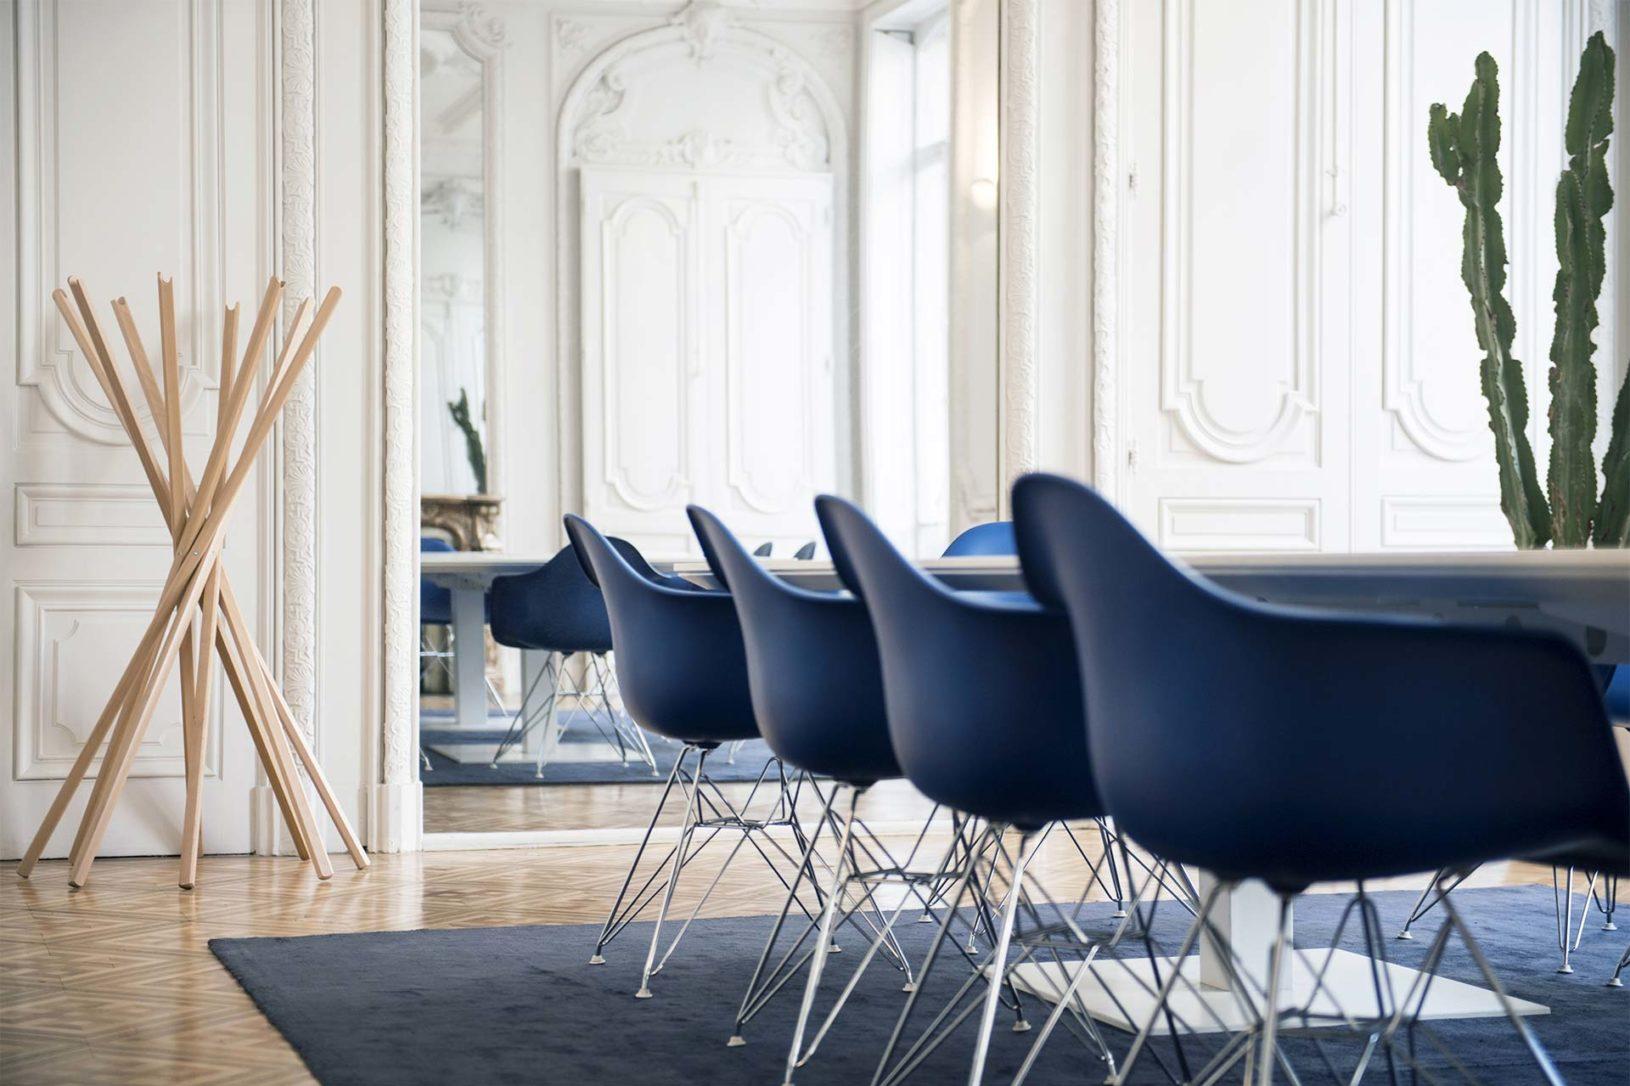 Cabinet d'avocats Viajuris Lyon